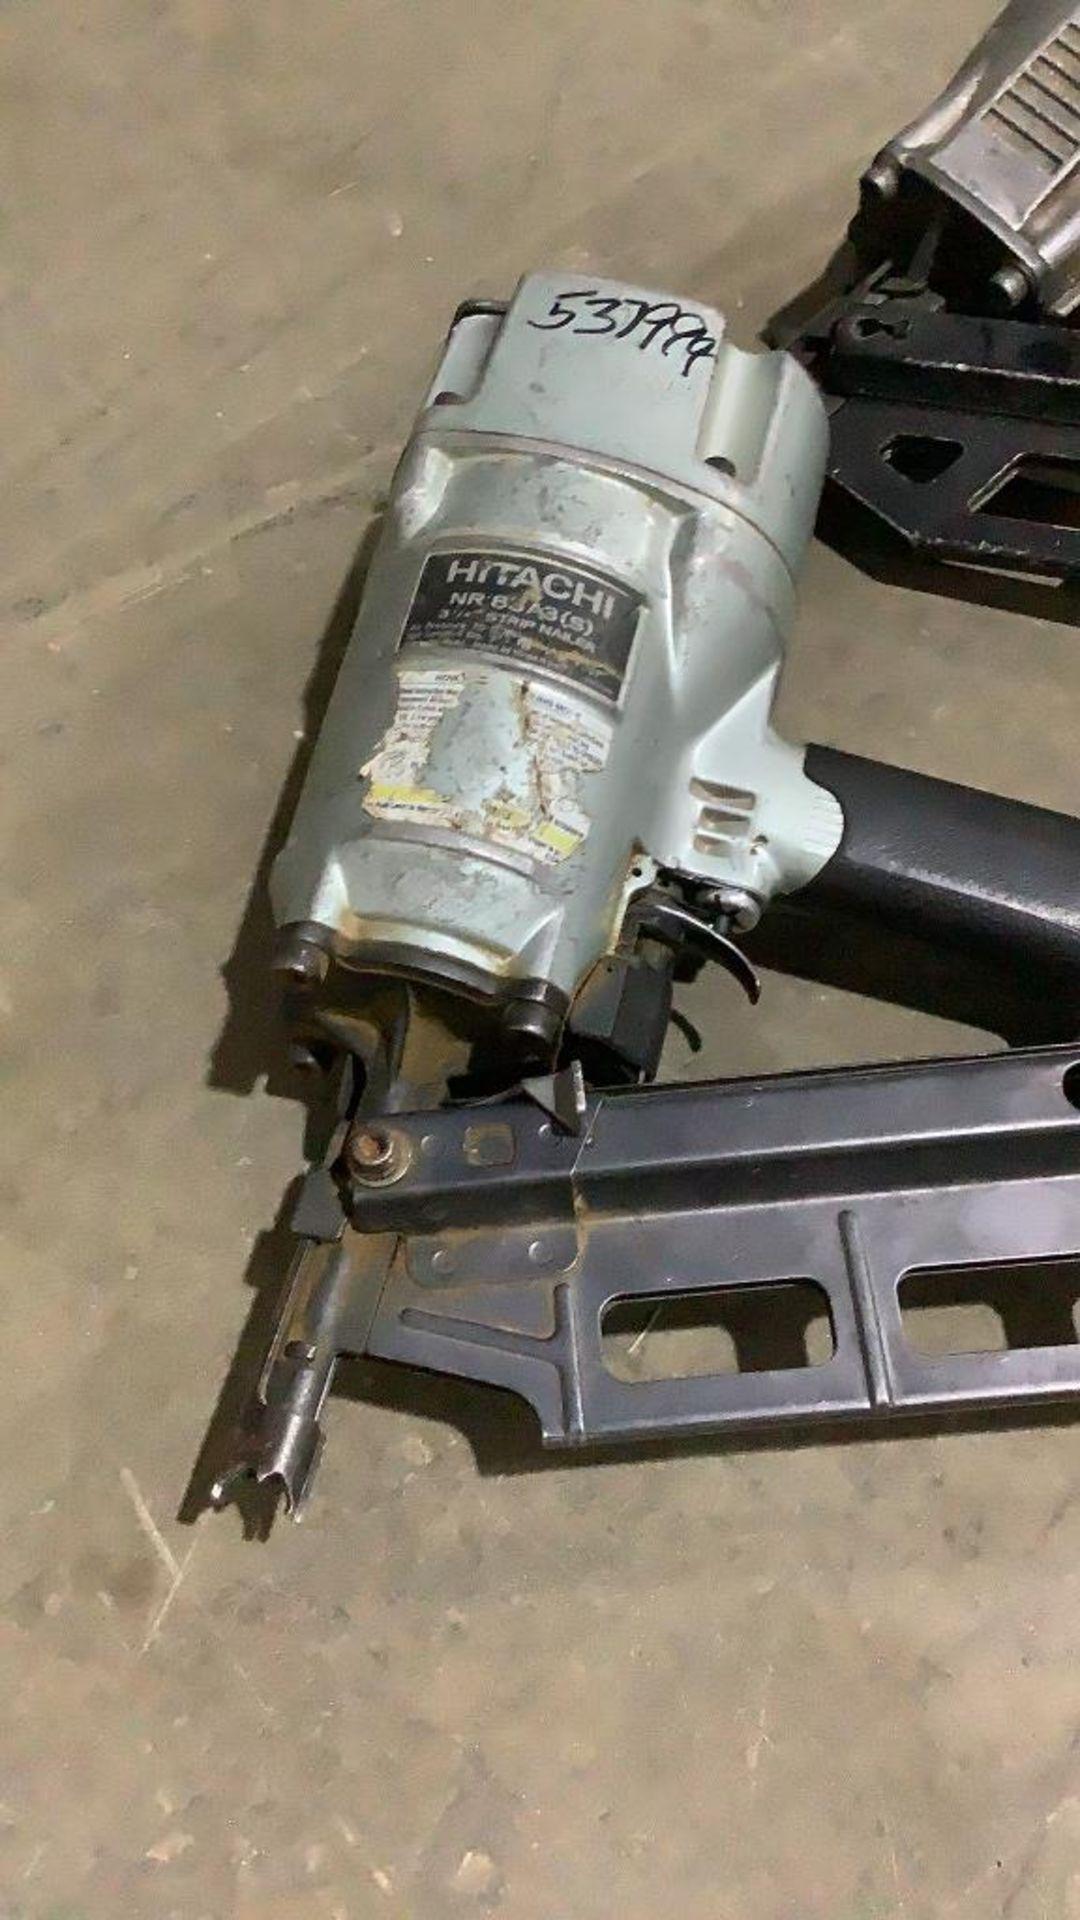 Lot 240 - (2) Pneumatic Strip Nailers